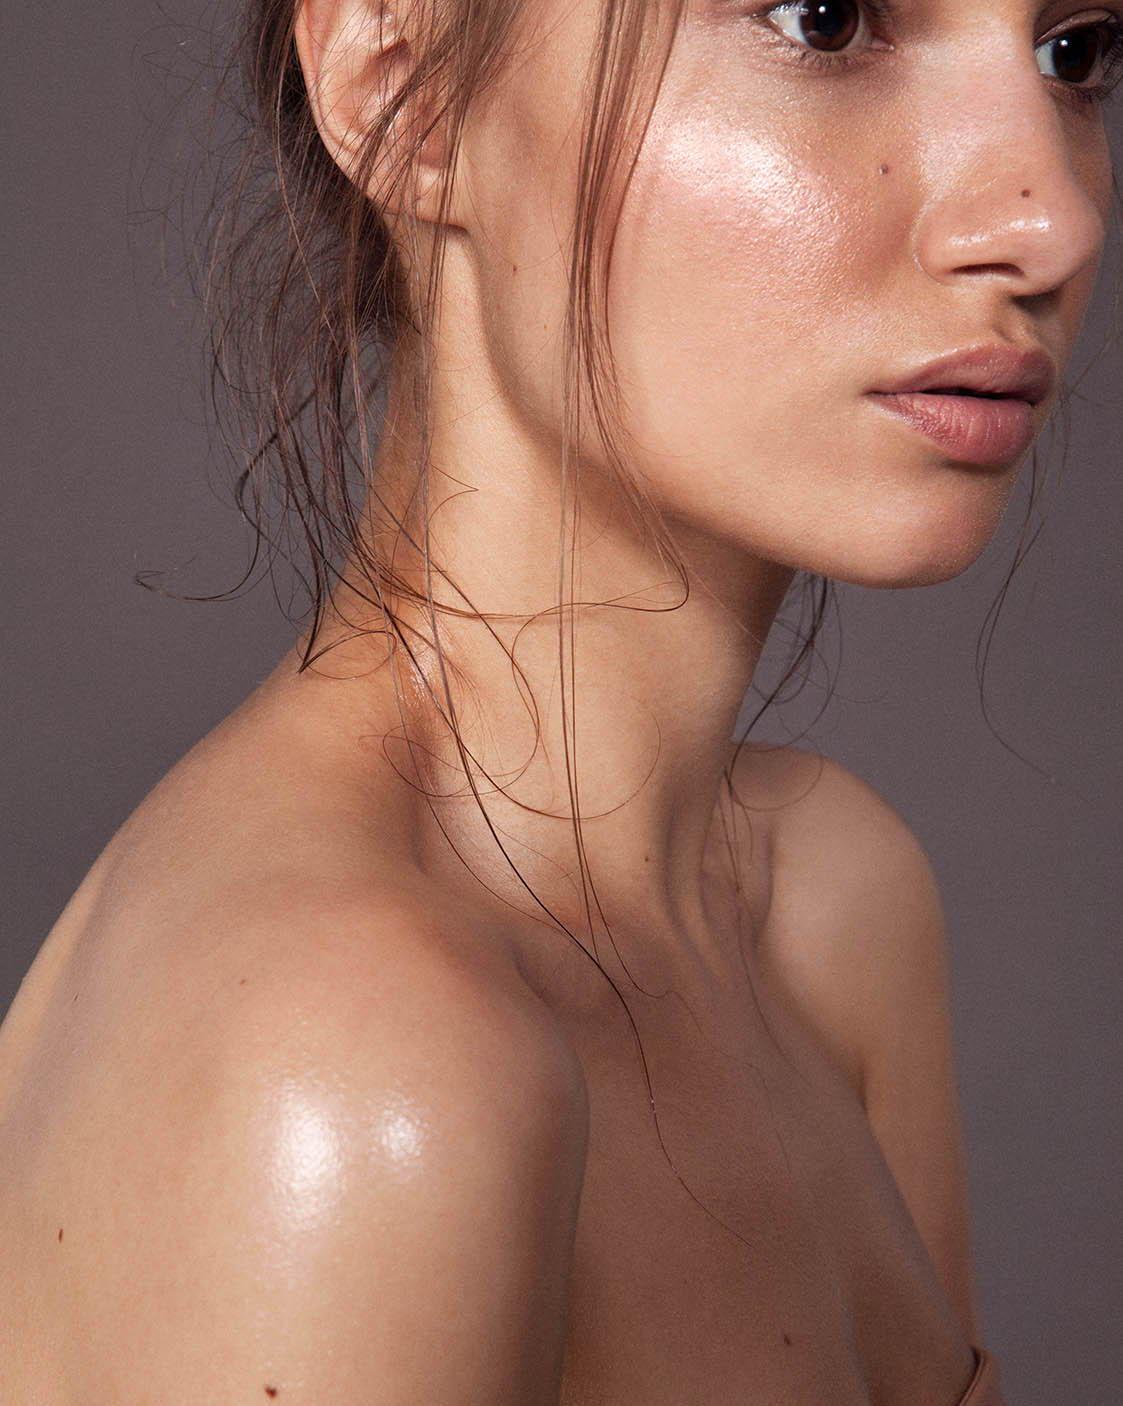 girl with glowing skin